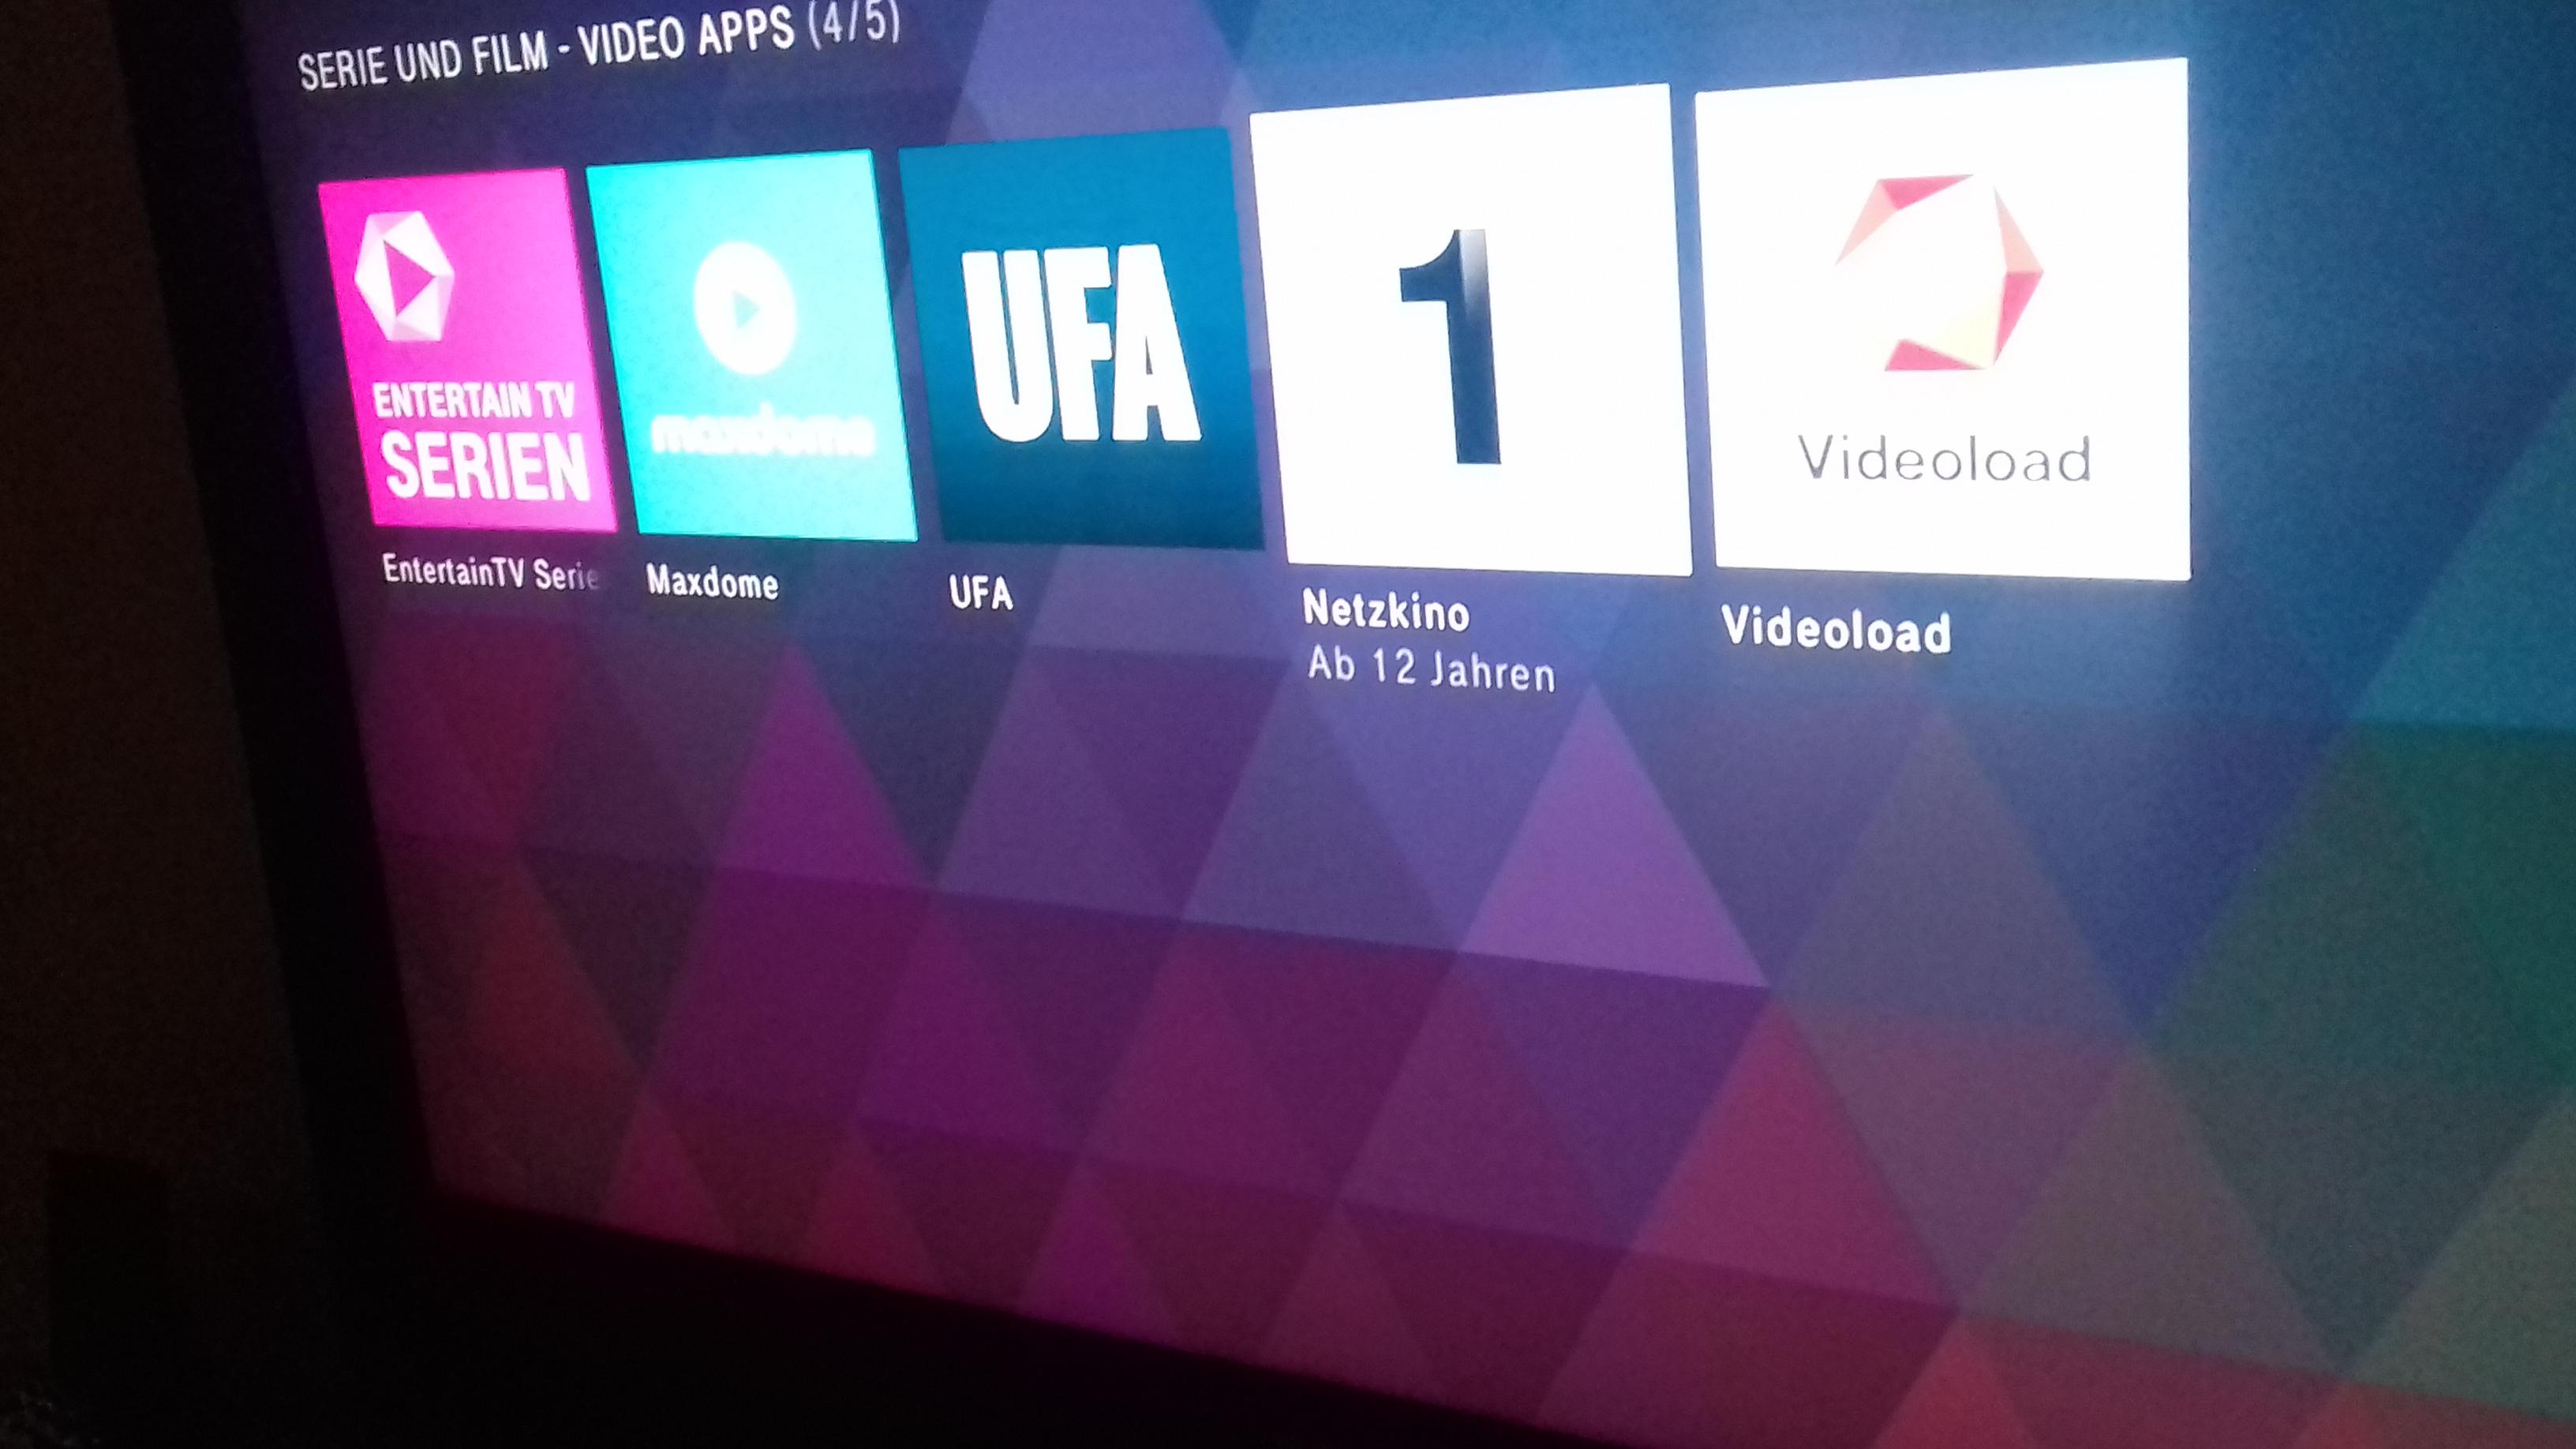 Community Media Receiver 401 Und Netflix Zugang Telekom Hilft